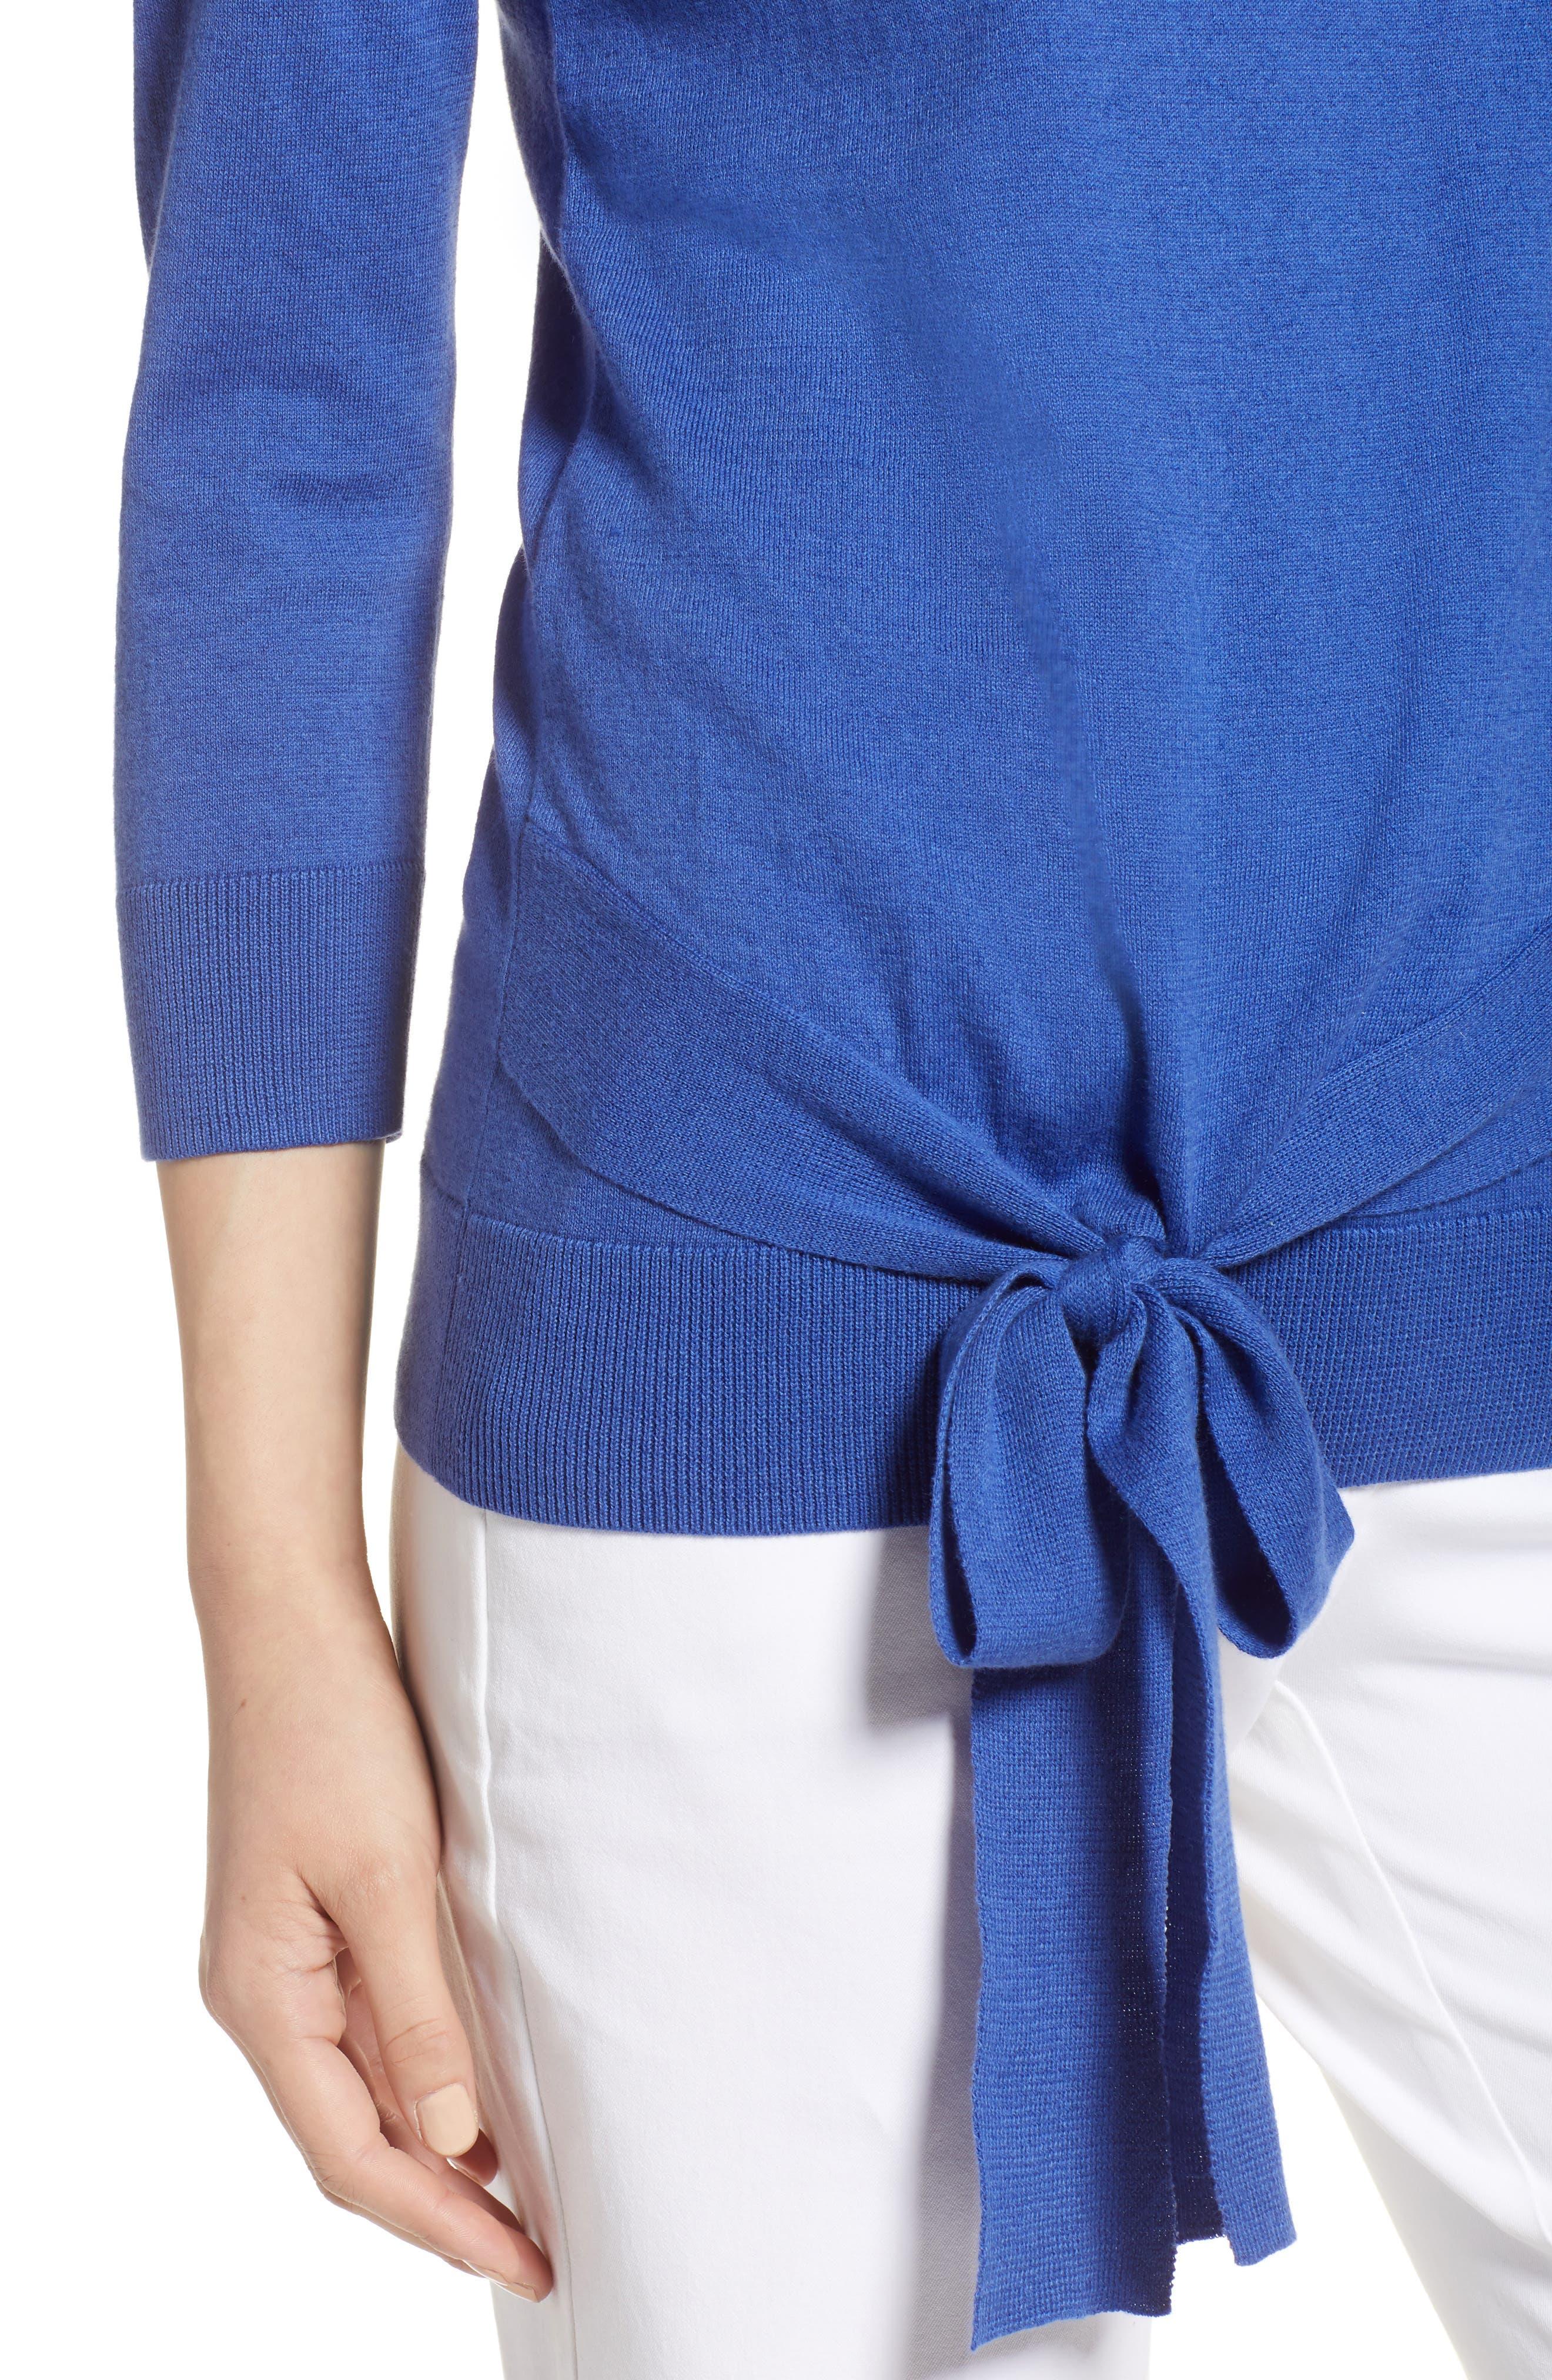 Pima Cotton Blend Tie Sweater,                             Alternate thumbnail 4, color,                             Blue Marine